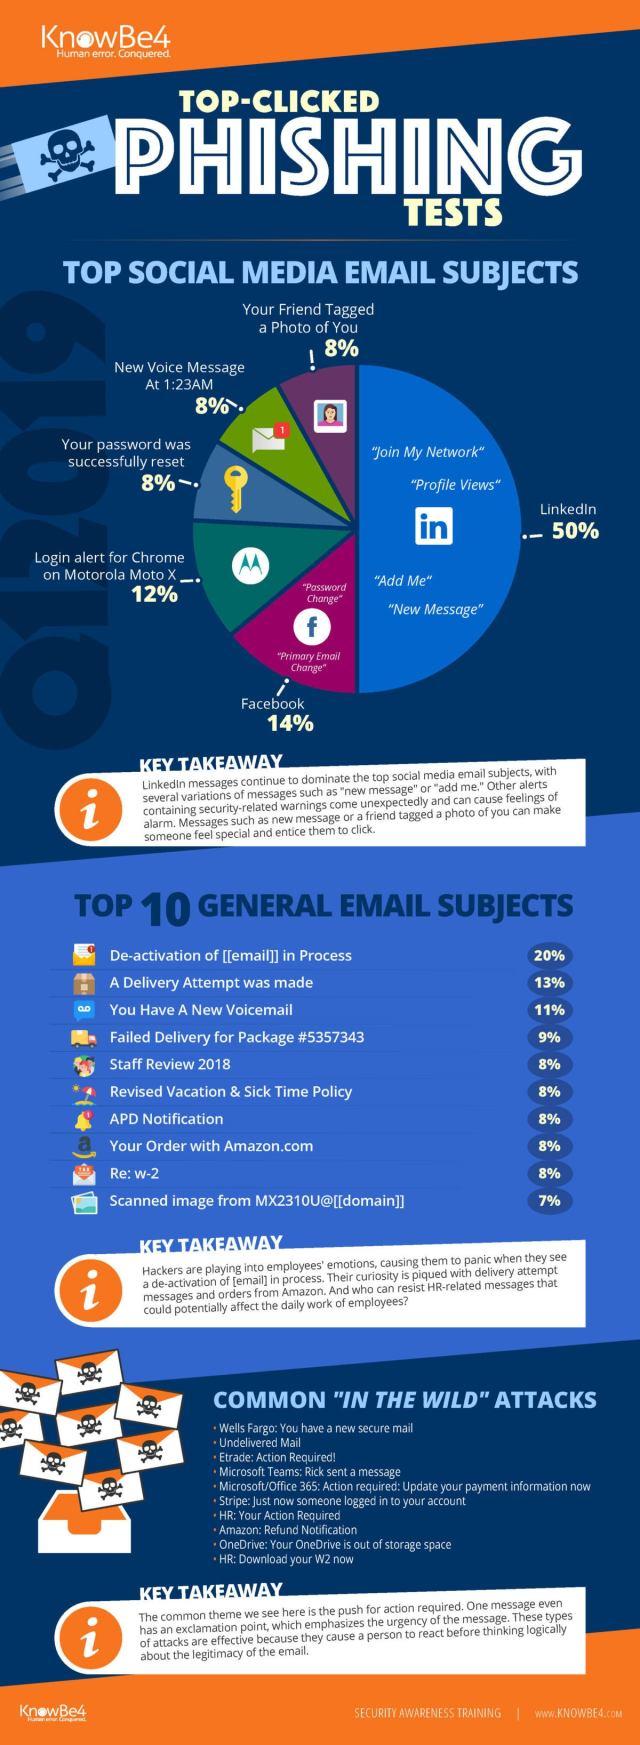 q12019 knowbe4 phishing infographic